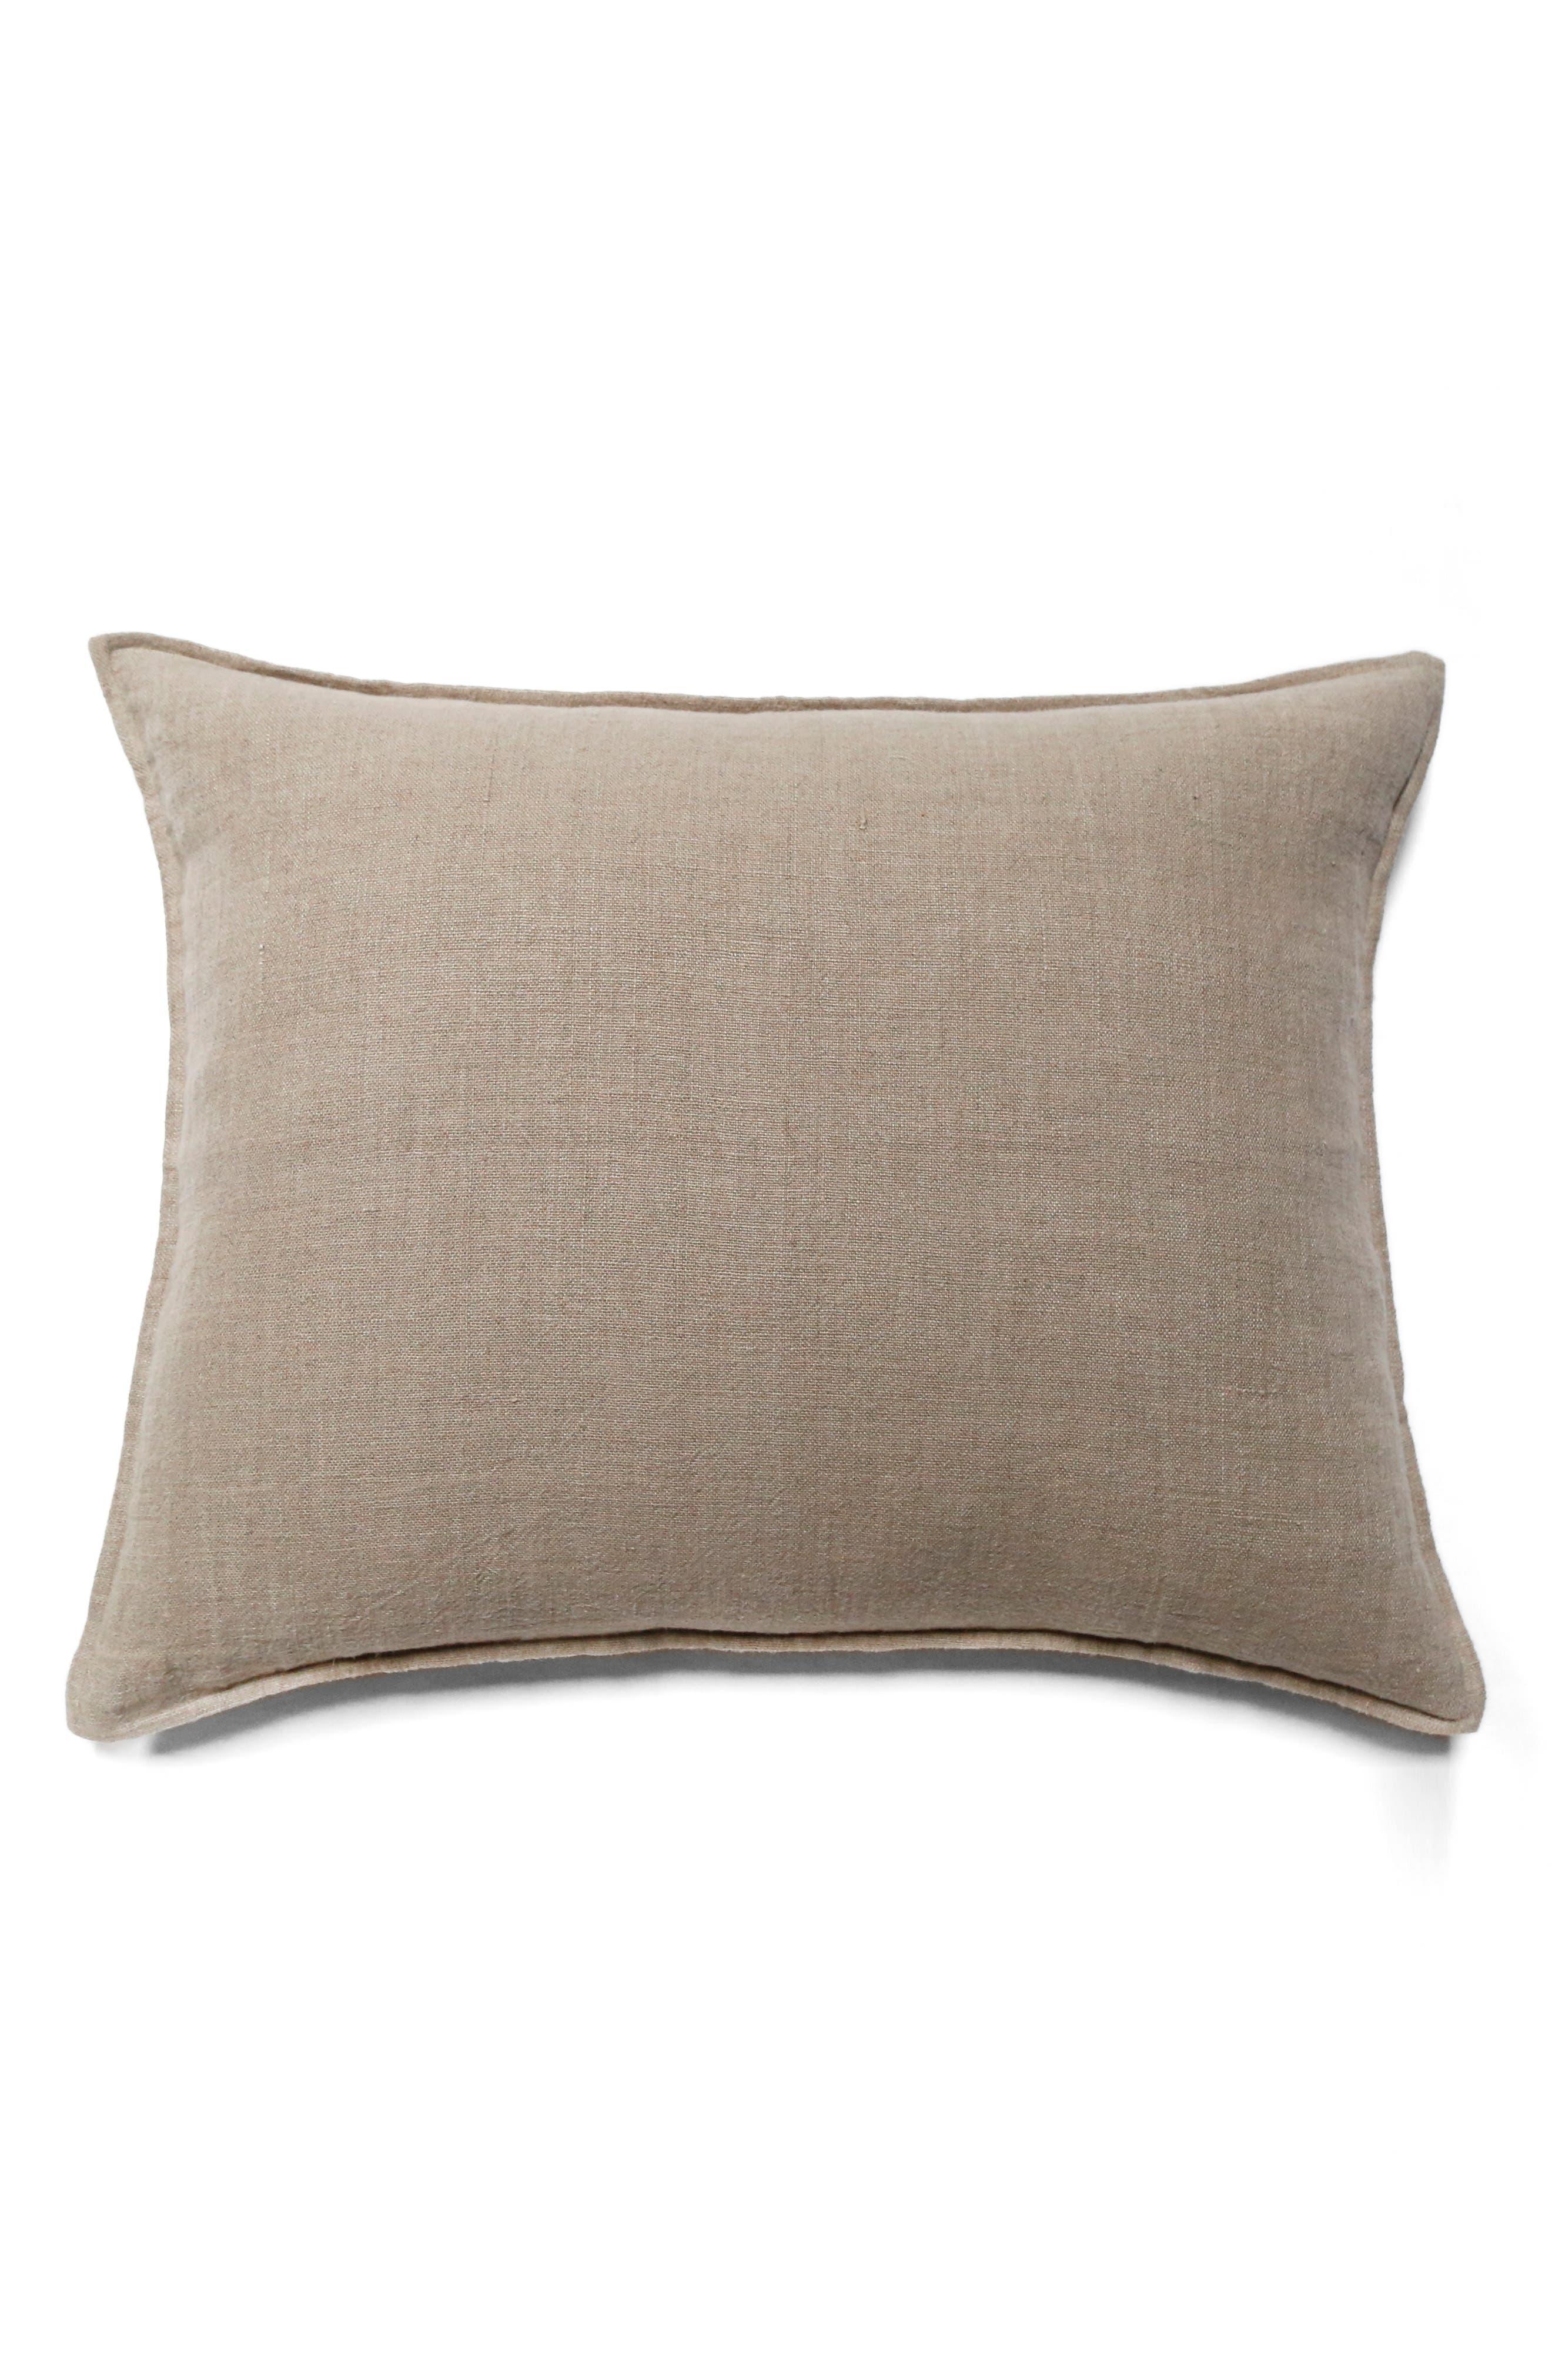 Pom Pom at Home Montauk Big Accent Pillow